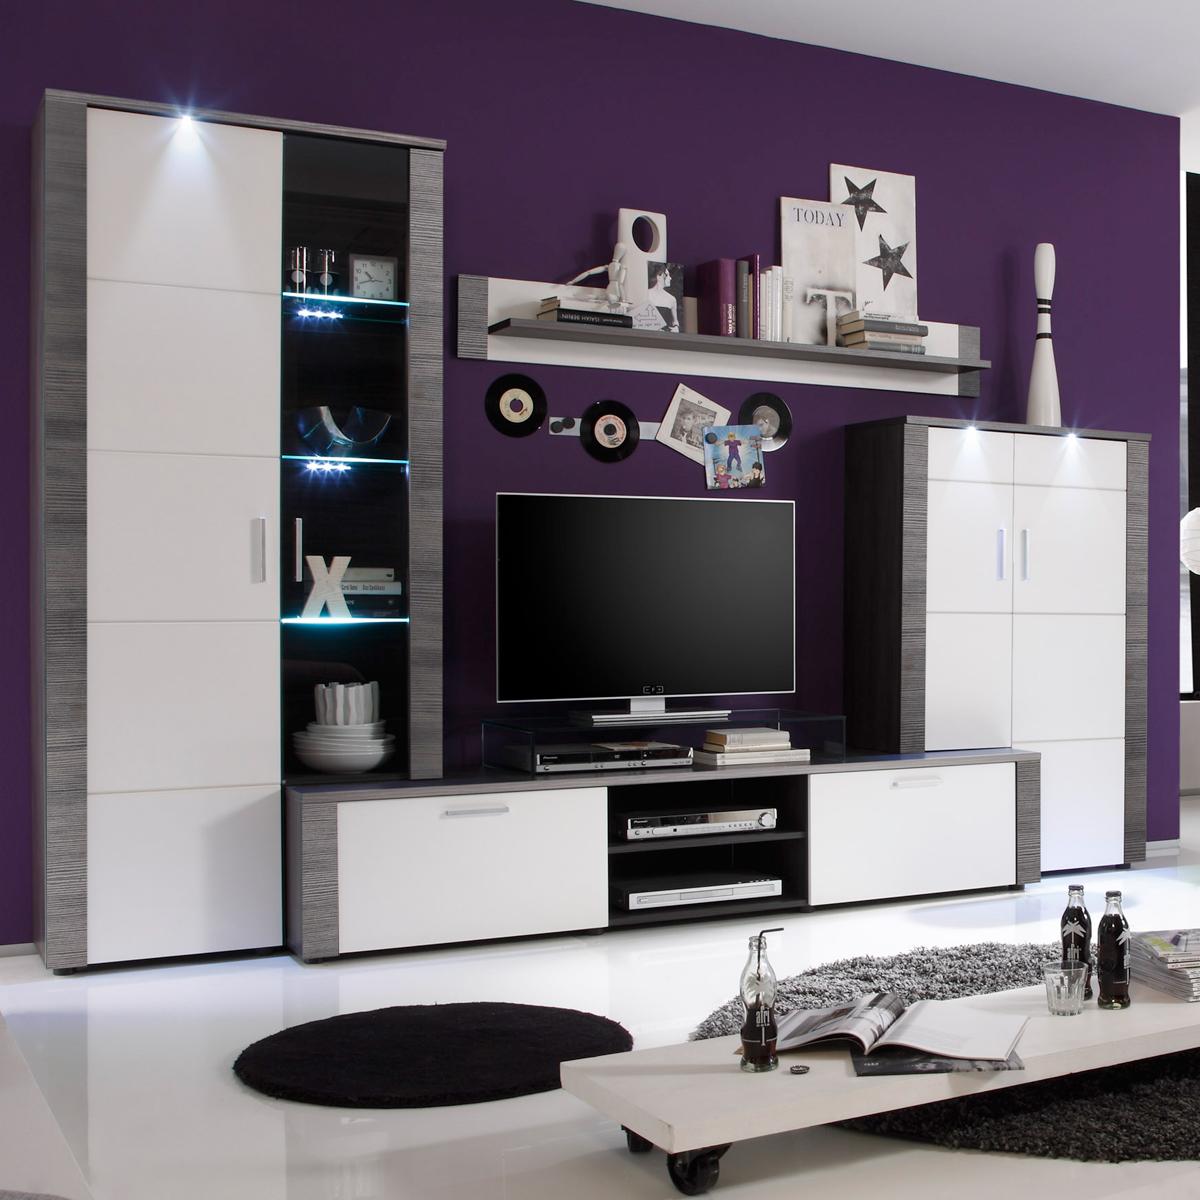 yarial.com = roller wohnwand grau ~ interessante ideen für die ... - Wohnwand Grau Ideen